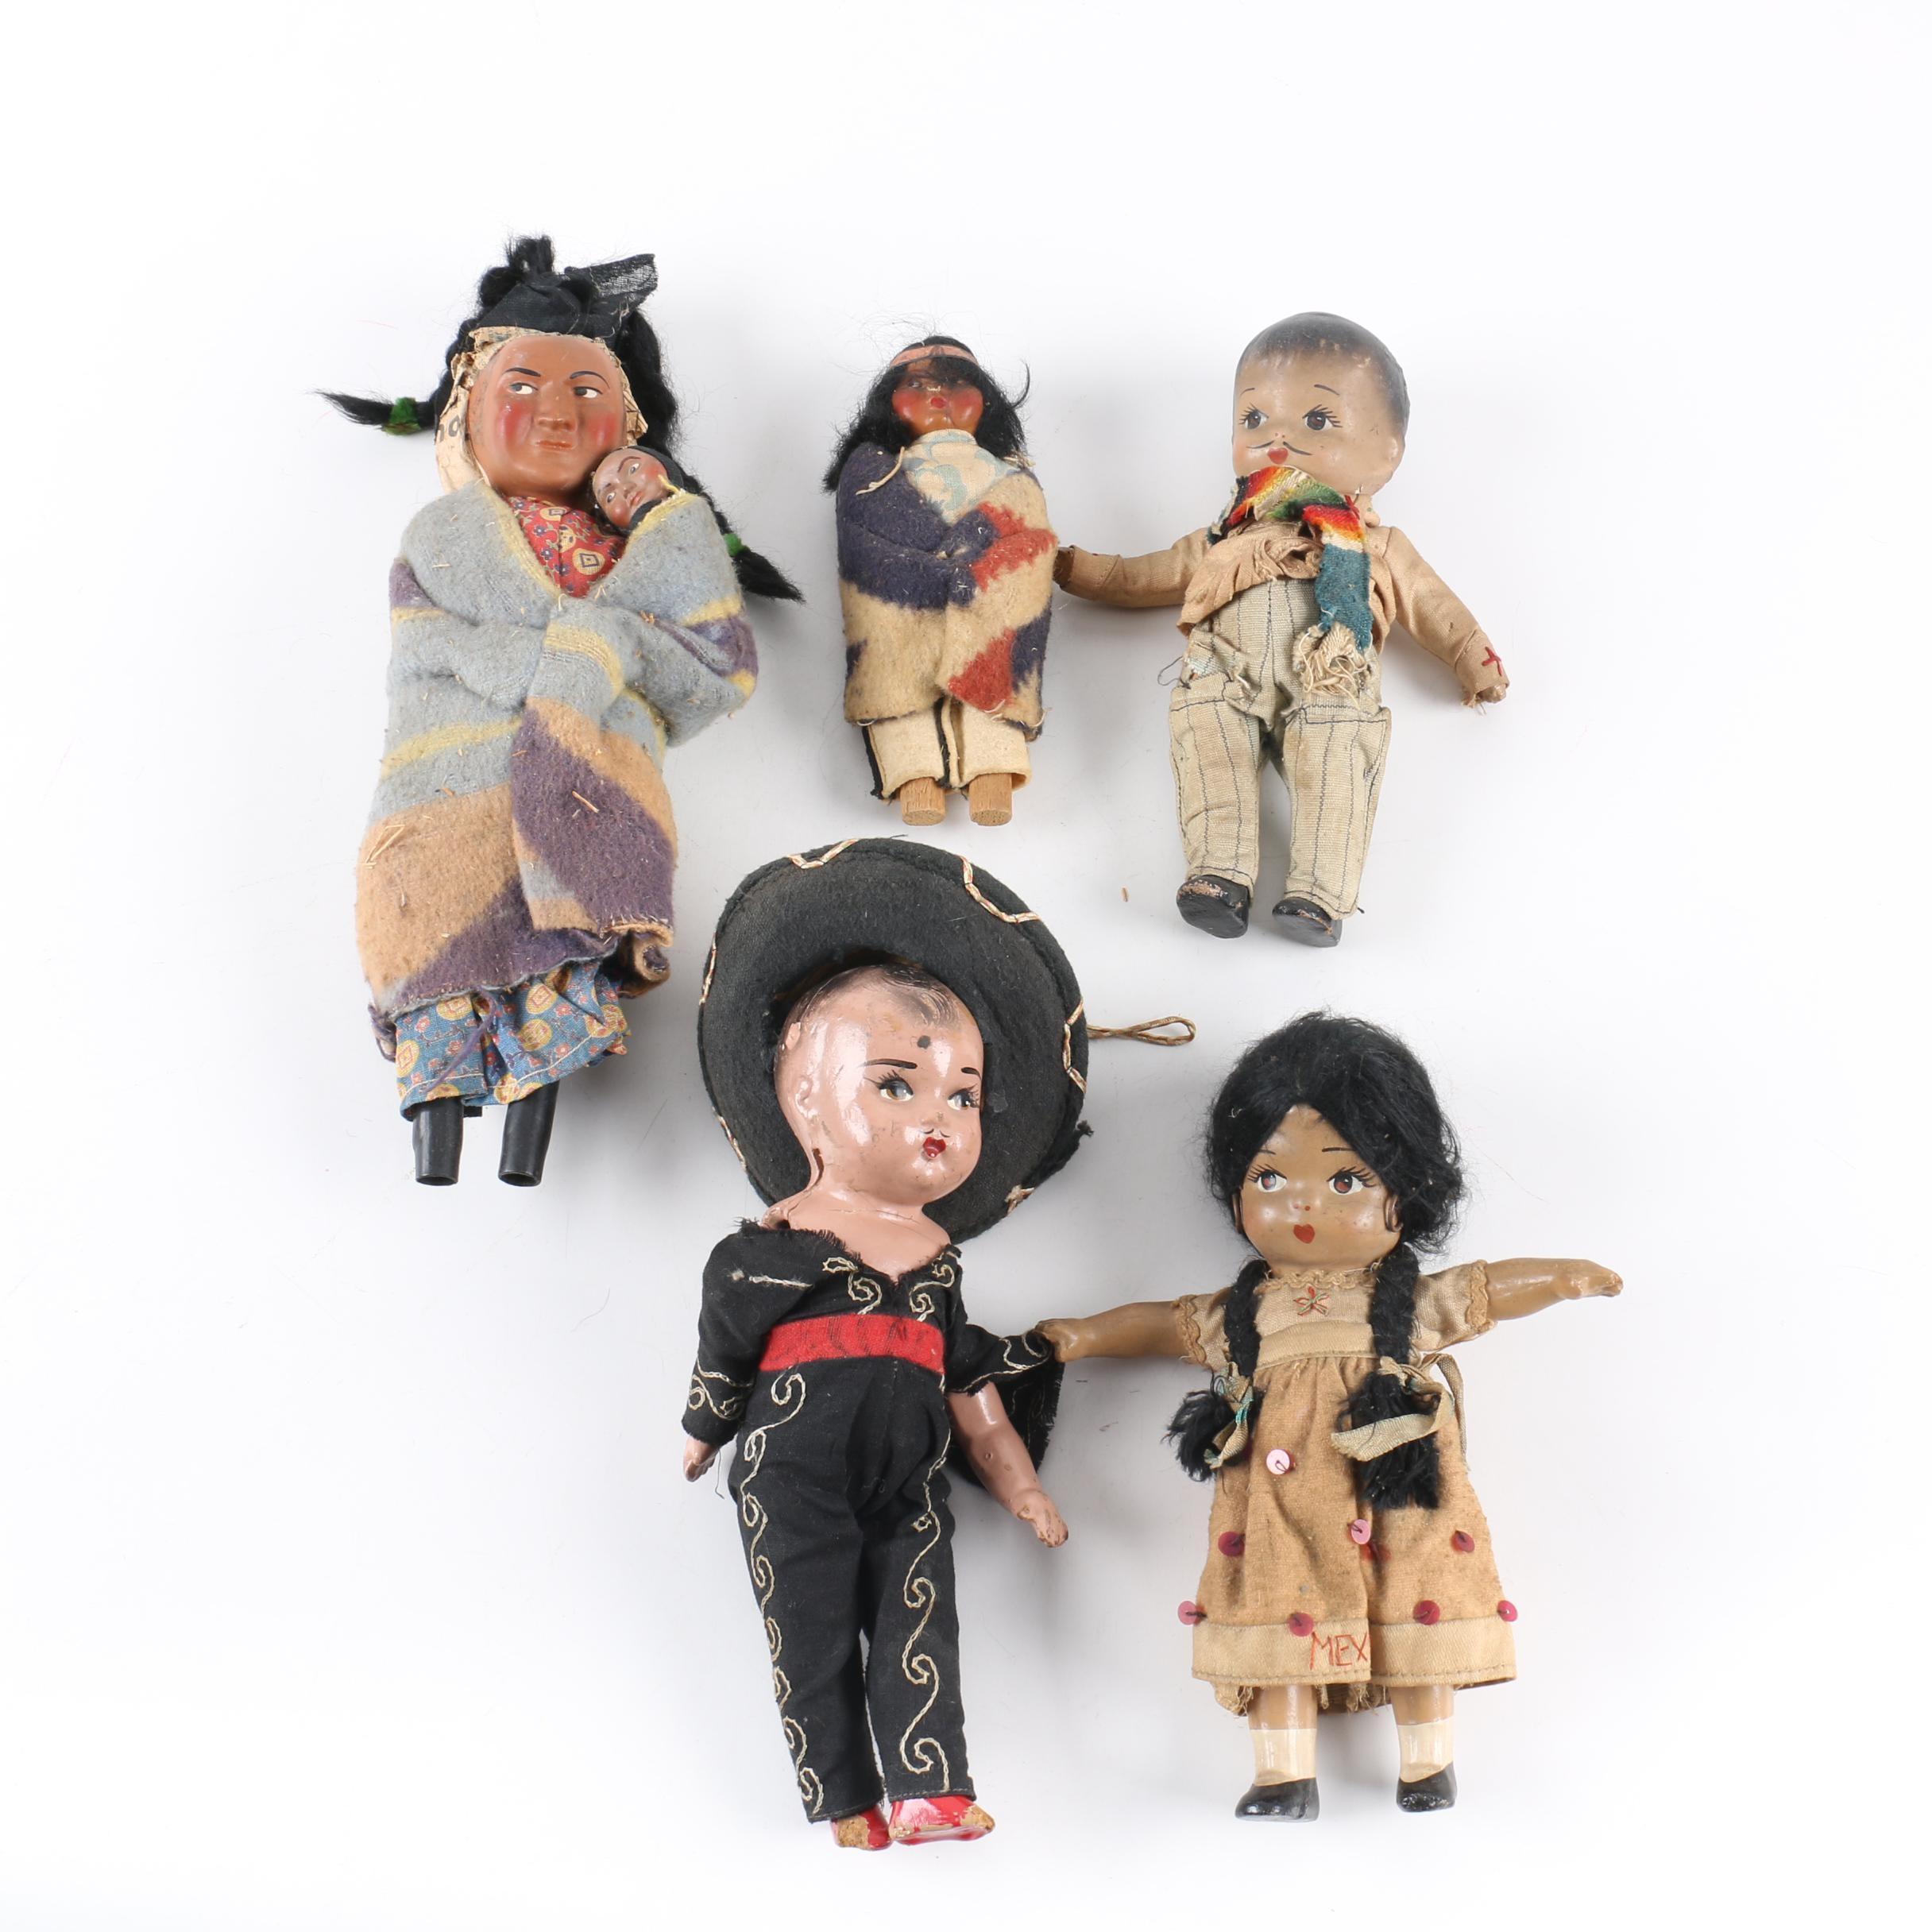 Vintage Skookum Style and Mexican Souvenir Dolls